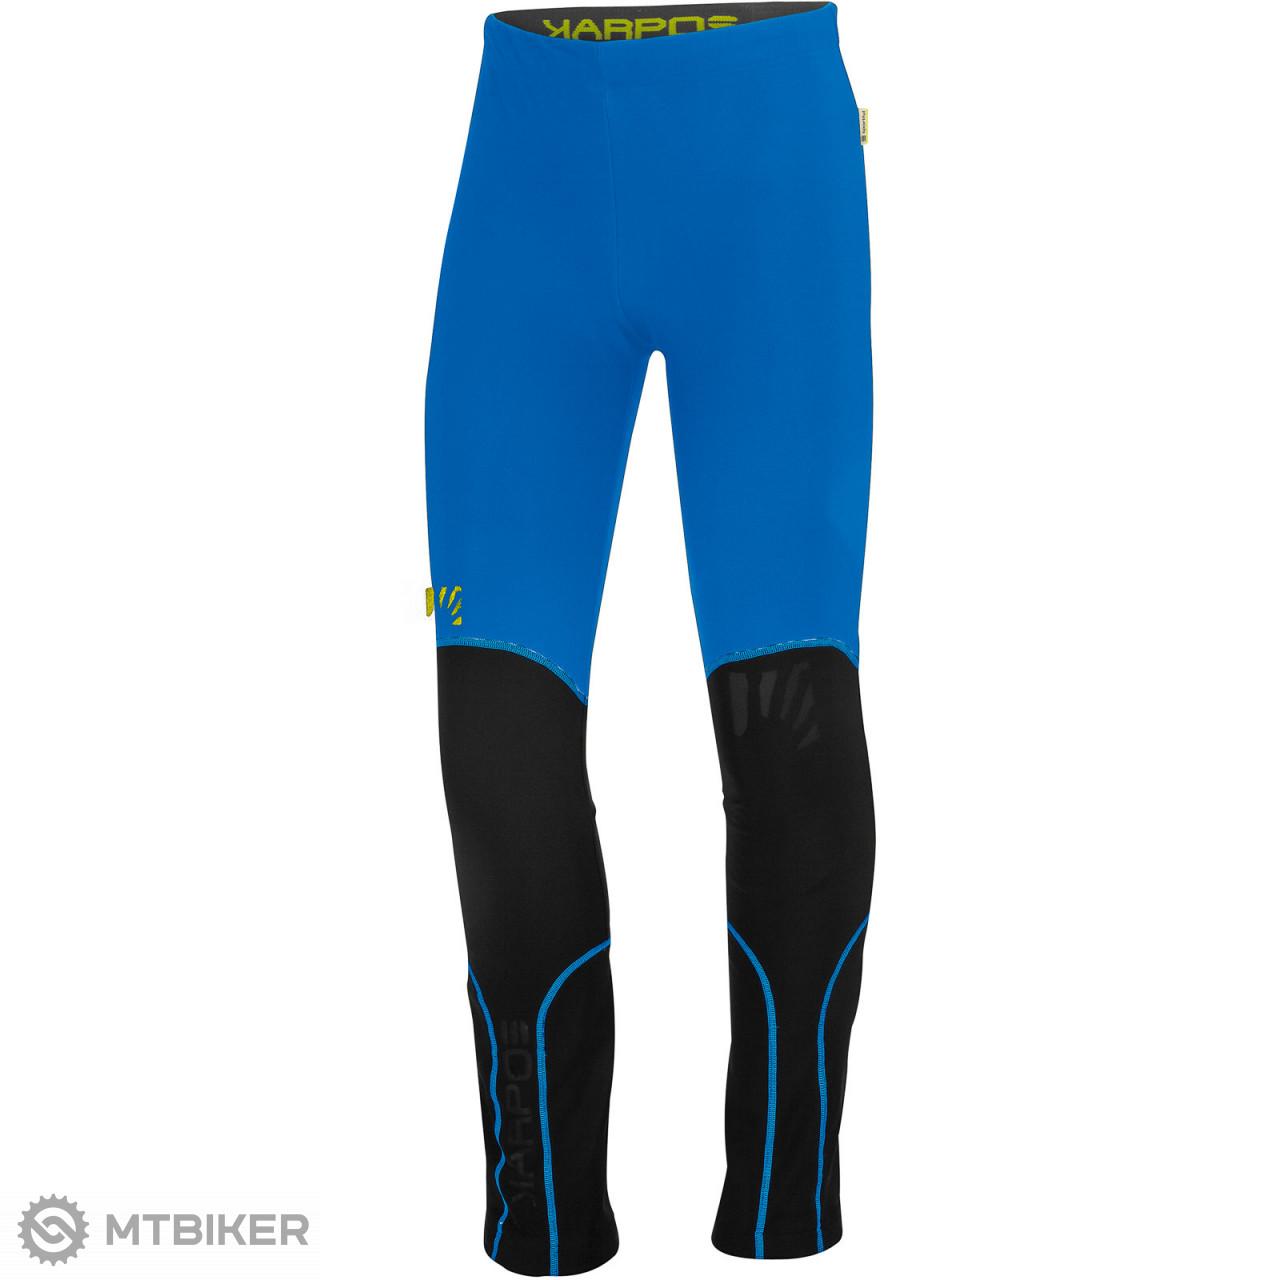 71e6639043 Karpos ALAGNA Nohavice modré čierne - MTBIKER Shop